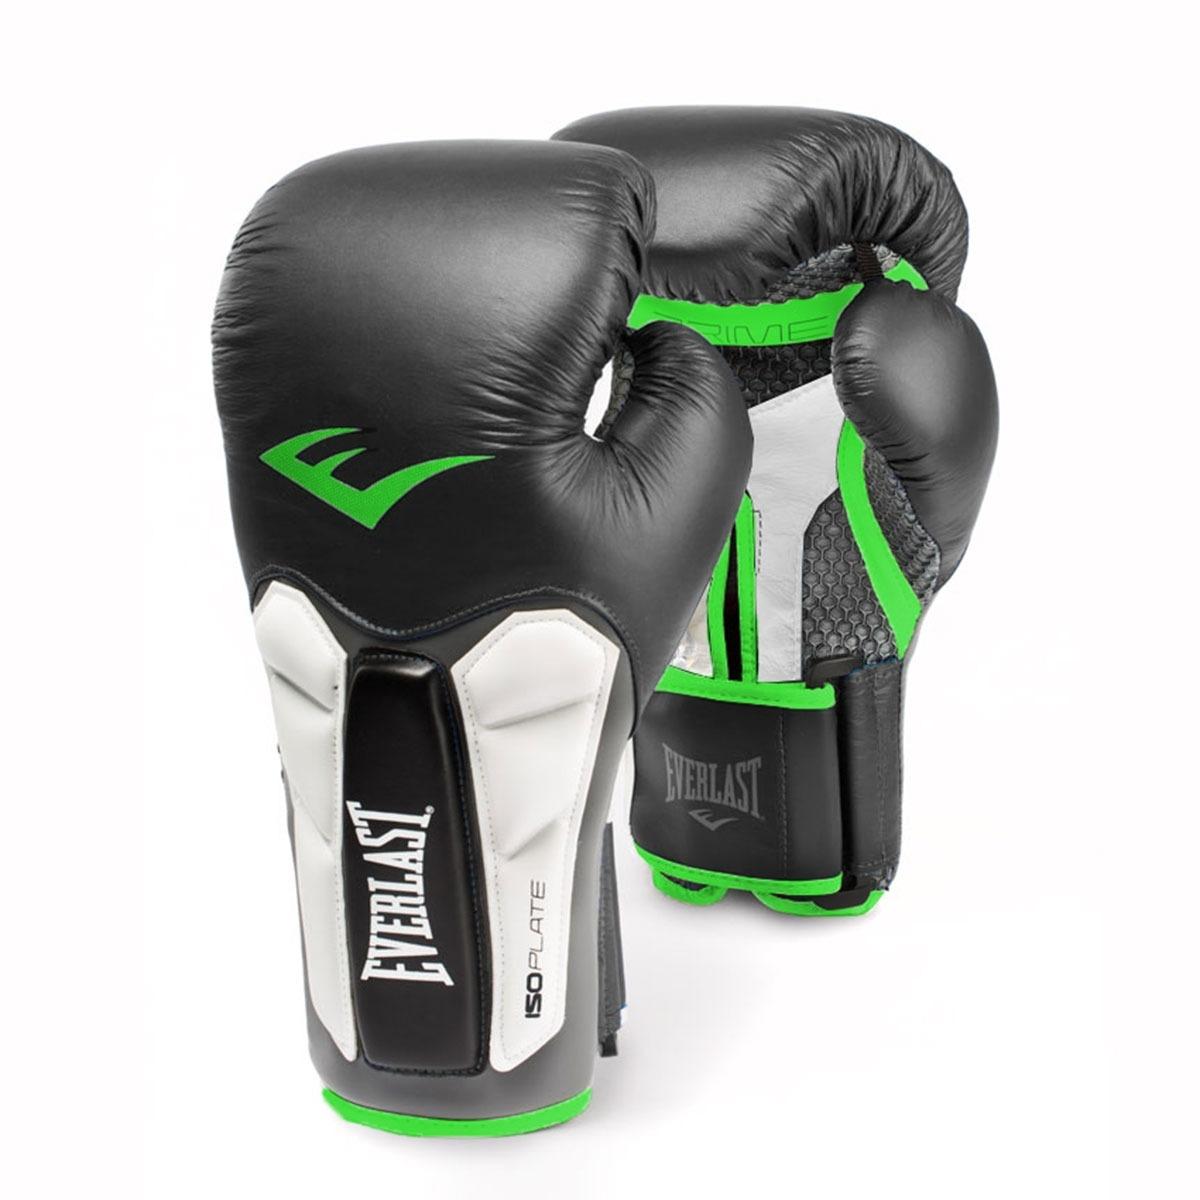 Luva Everlast Boxe Muay Thai Elite Prime Everlast - R  198 377bda6feb812